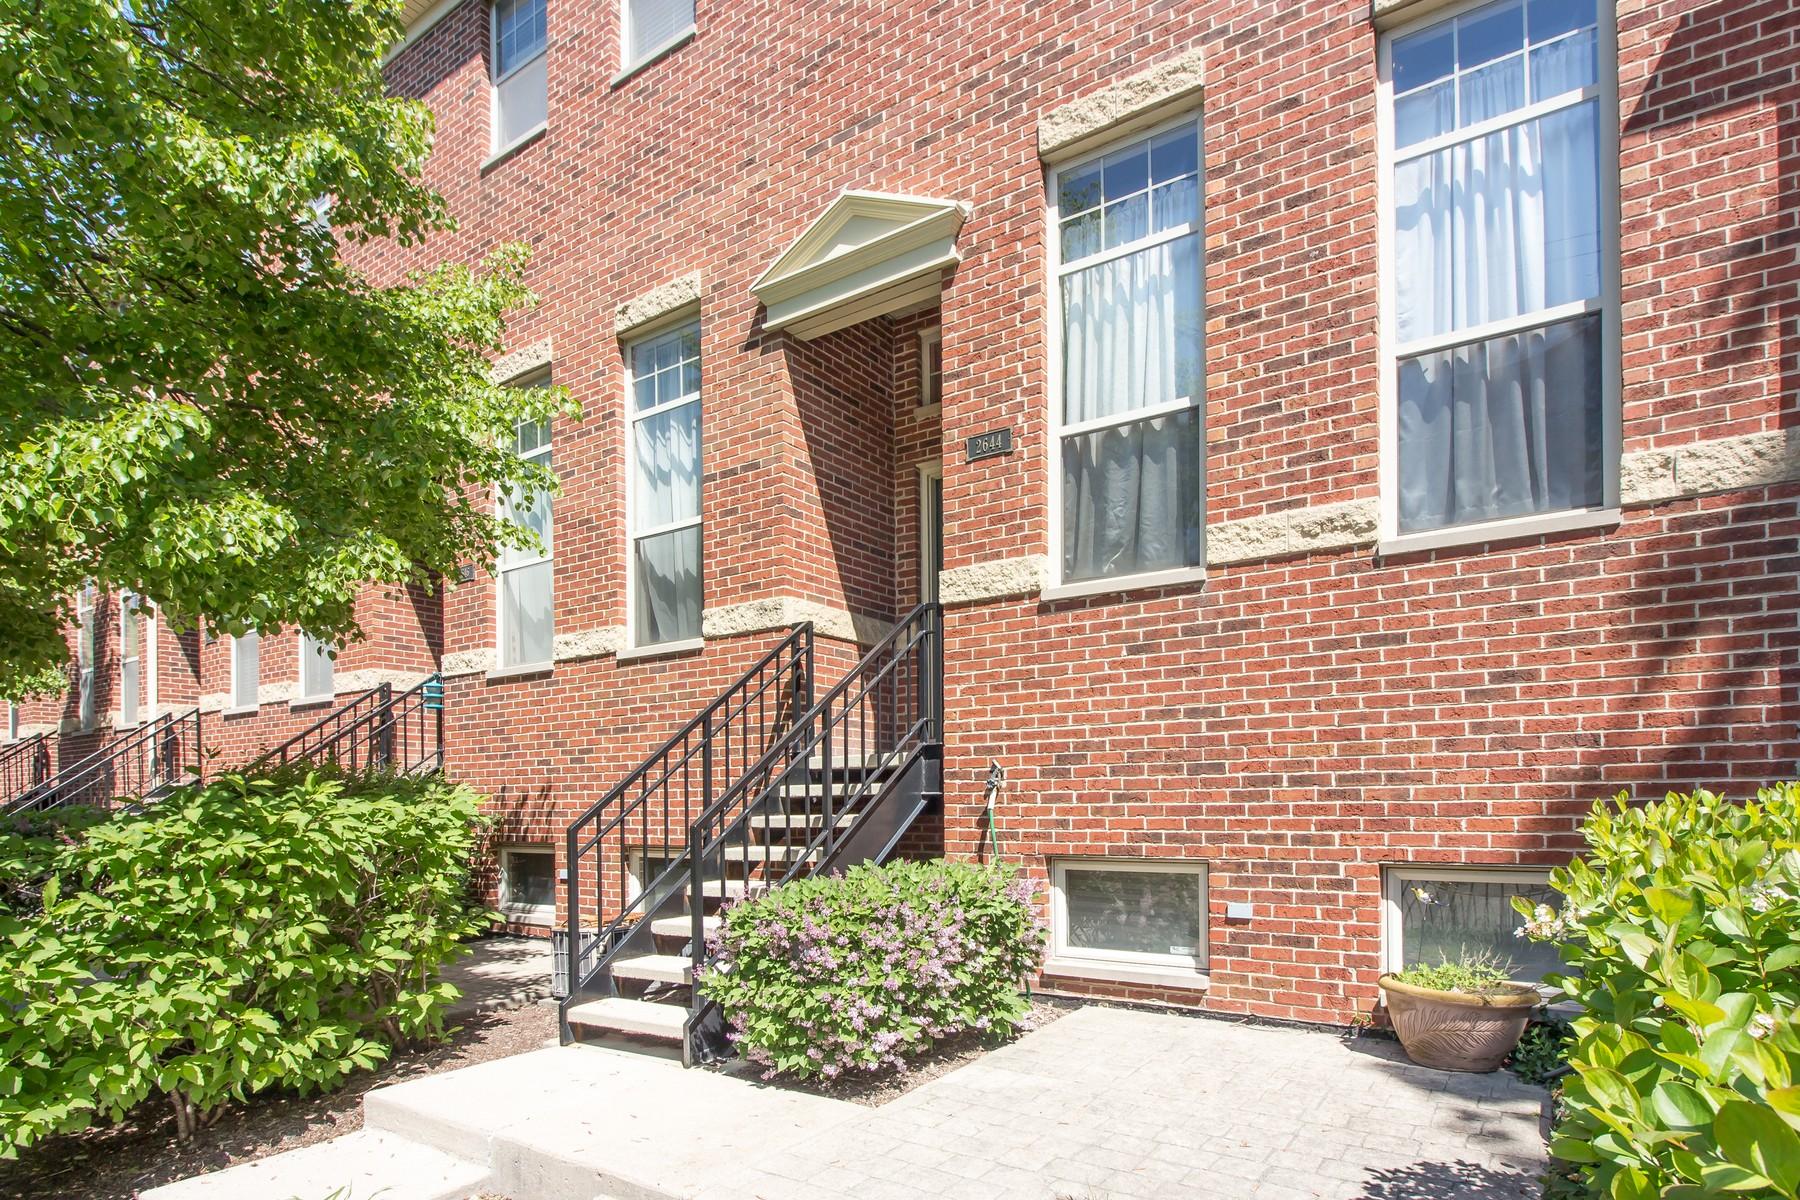 Casa unifamiliar adosada (Townhouse) por un Venta en Sunny Avondale Townhome 2644 W Belmont Avenue Chicago, Illinois, 60618 Estados Unidos